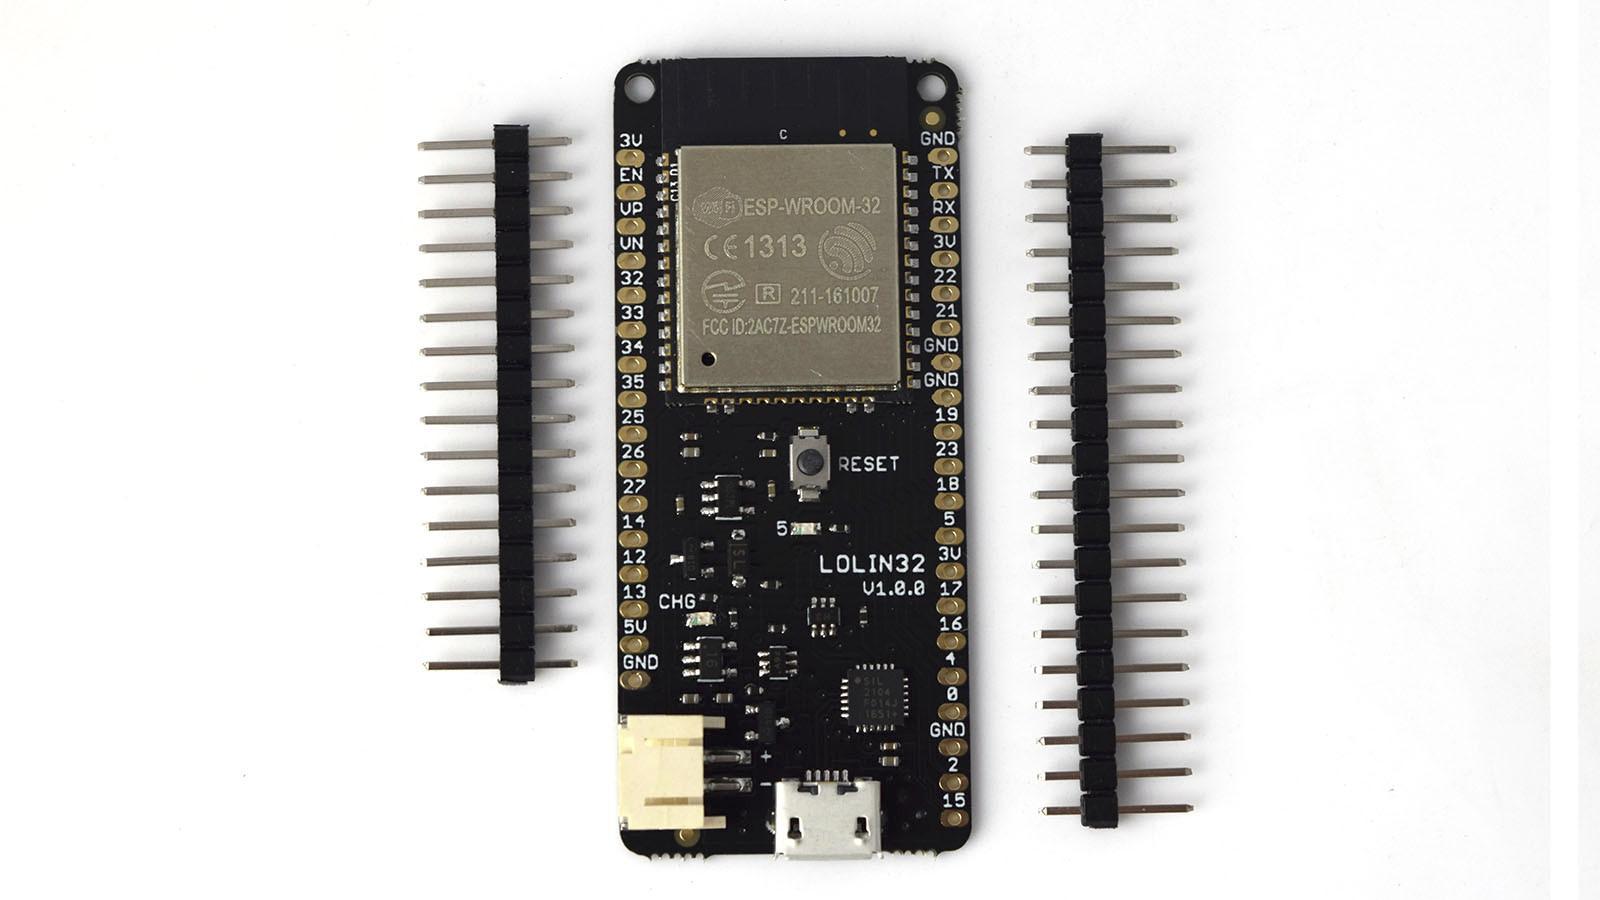 $6 90 Wemos LoLin32 ESP32 Development Board Comes with 4MB Flash